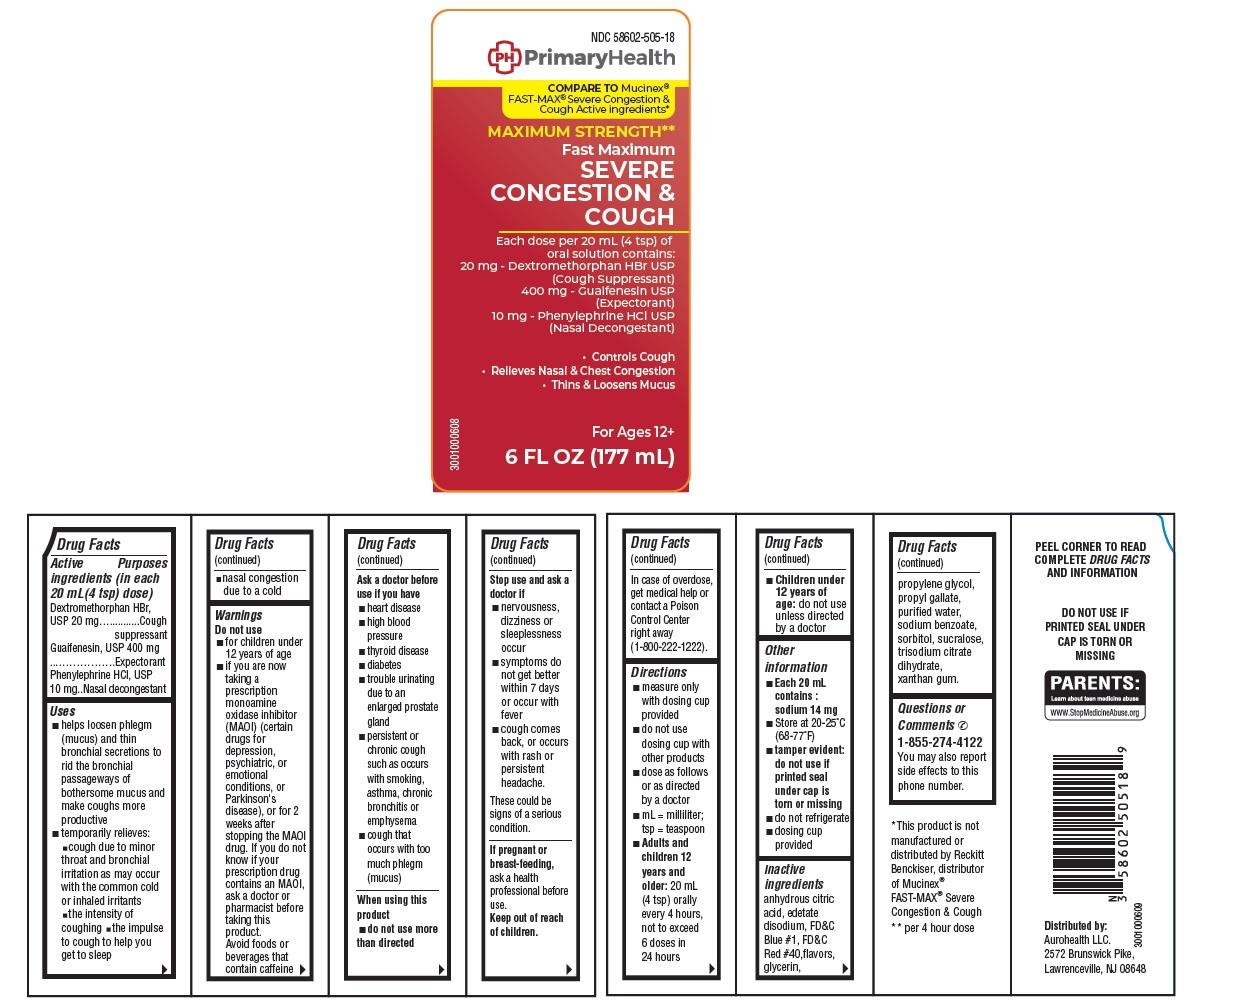 PACKAGE LABEL-PRINCIPAL DISPLAY PANEL 6 FL OZ (177 mL Bottle)